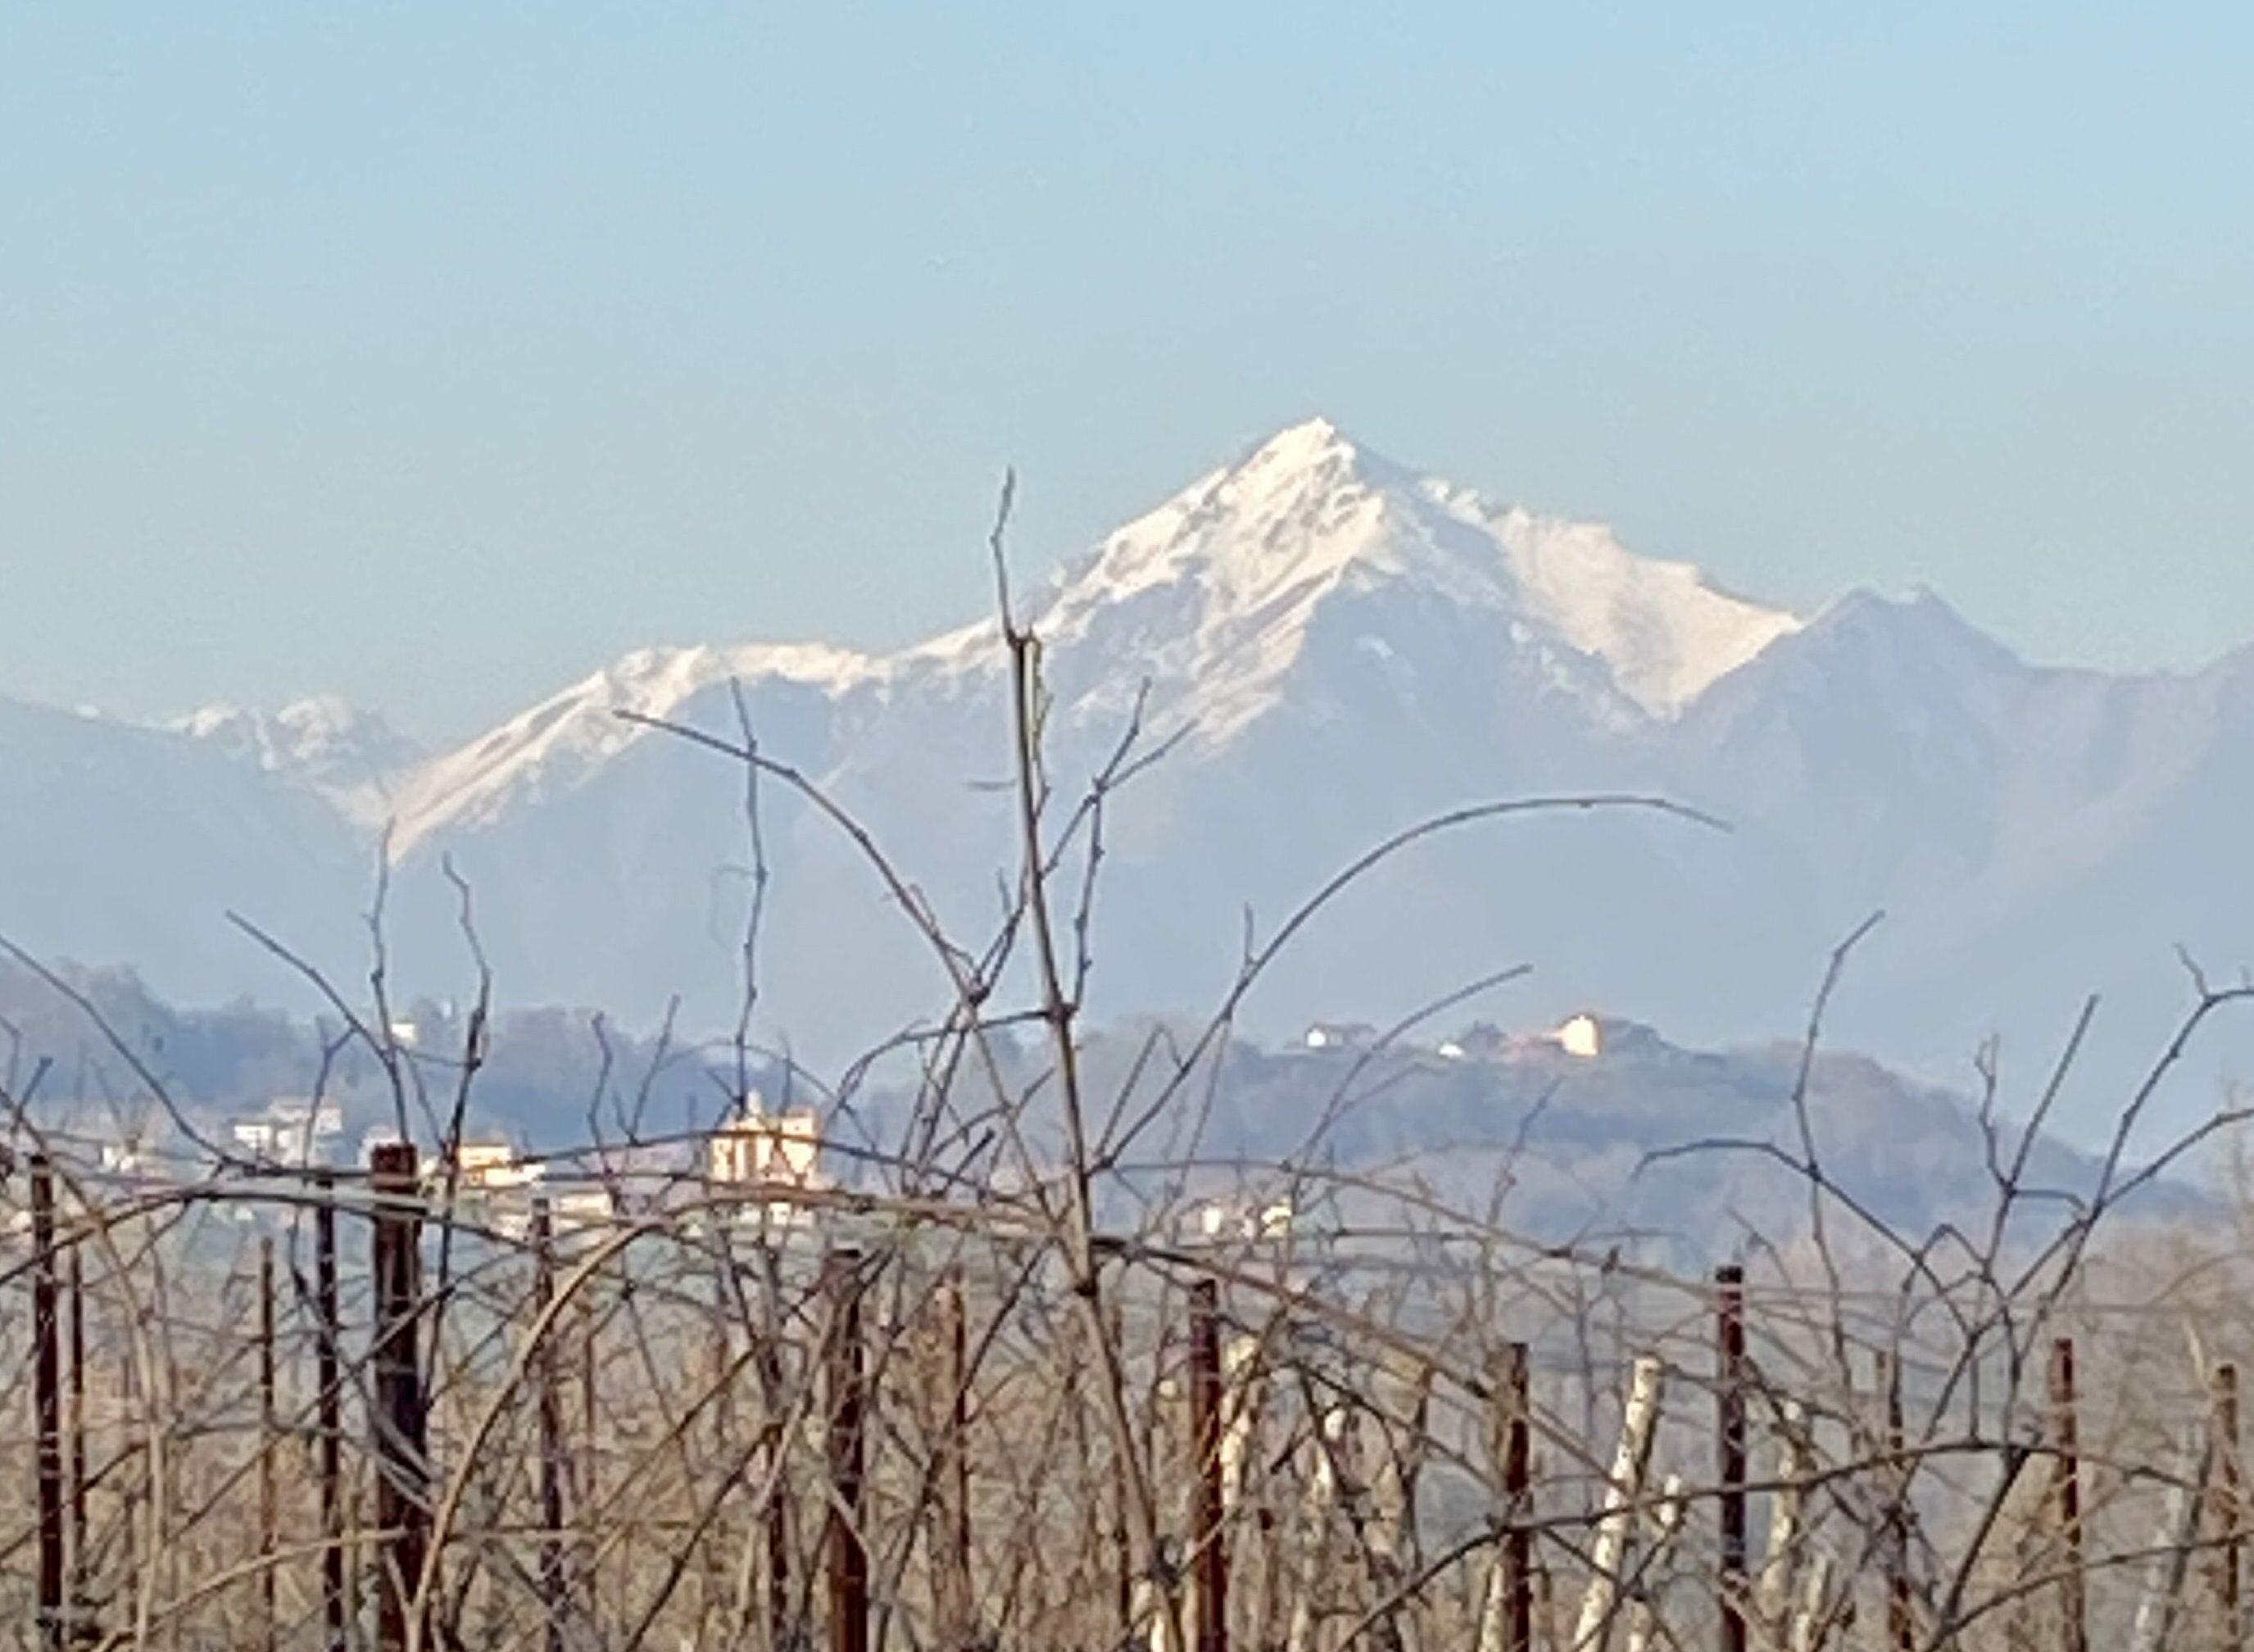 Reisverslag Piemonte Januari 2020